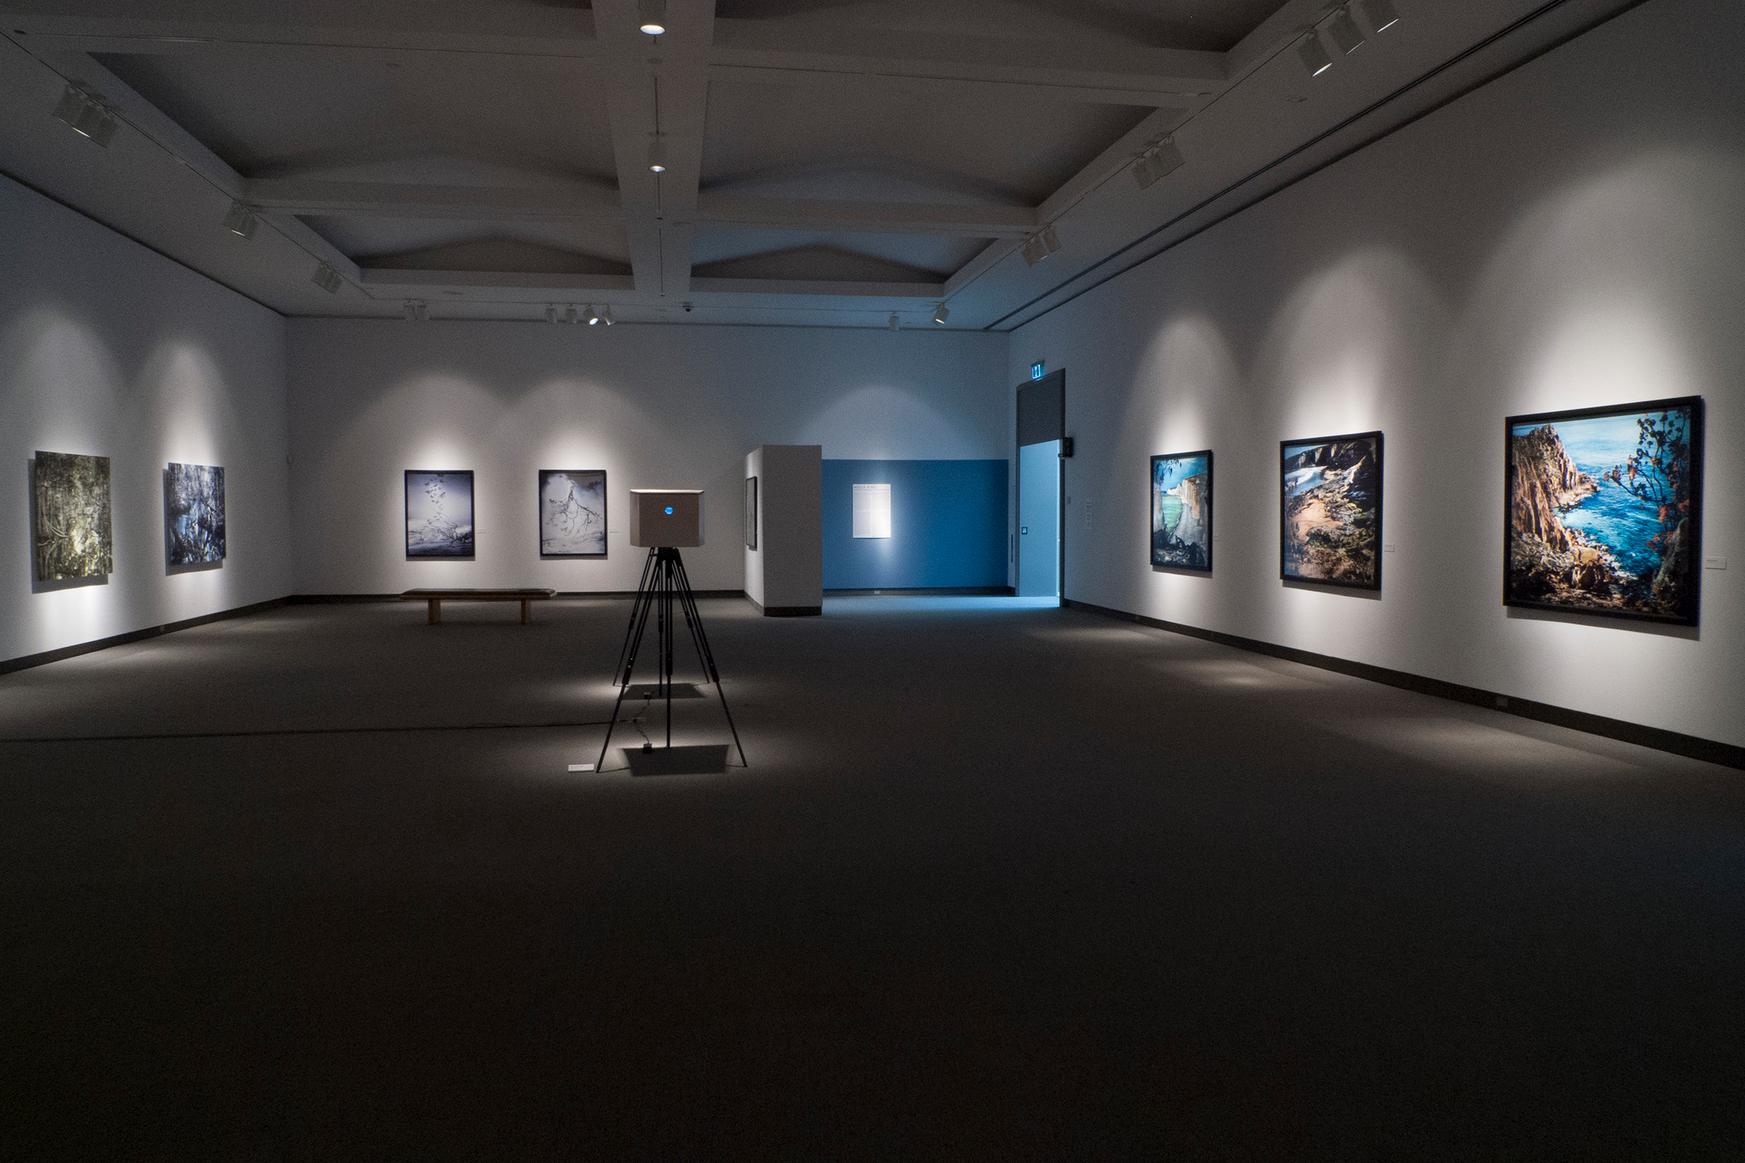 Intallation View, Robert McLaughlin Gallery, 2016